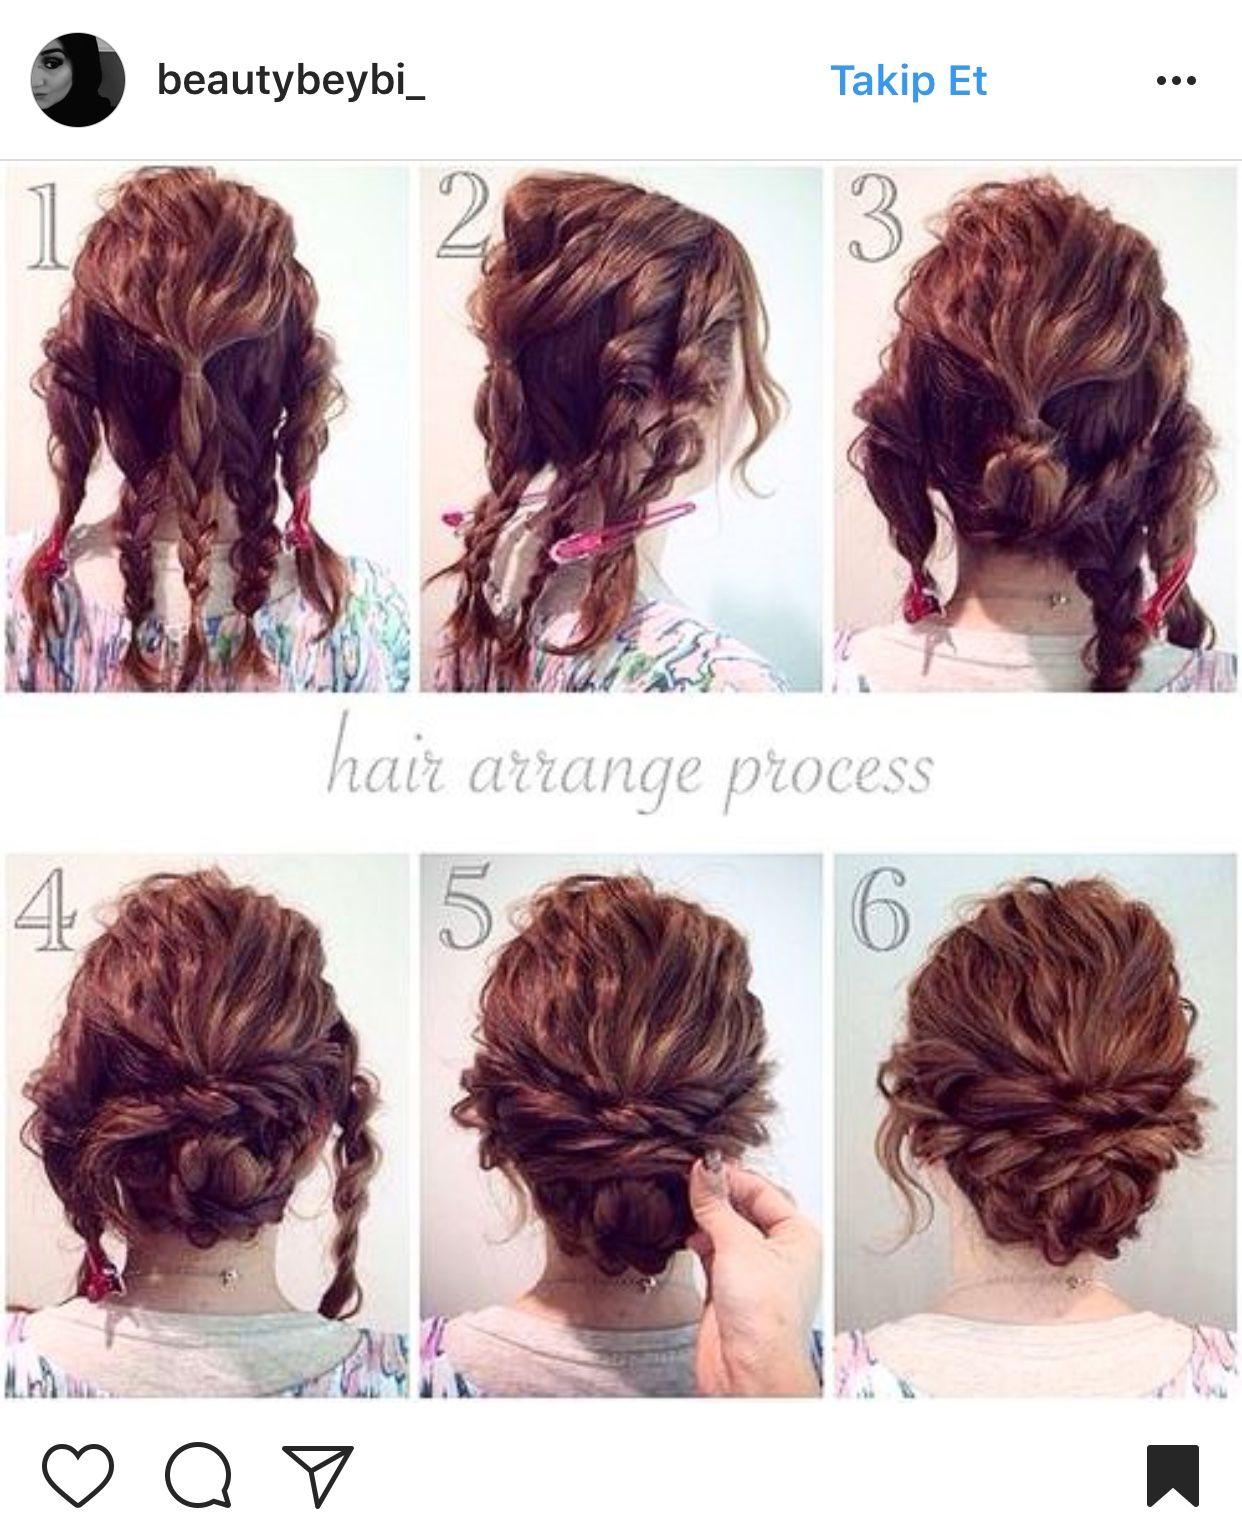 Pin by Marifer Ascencio on Hair | Pinterest | Medium hair, Updos and ...